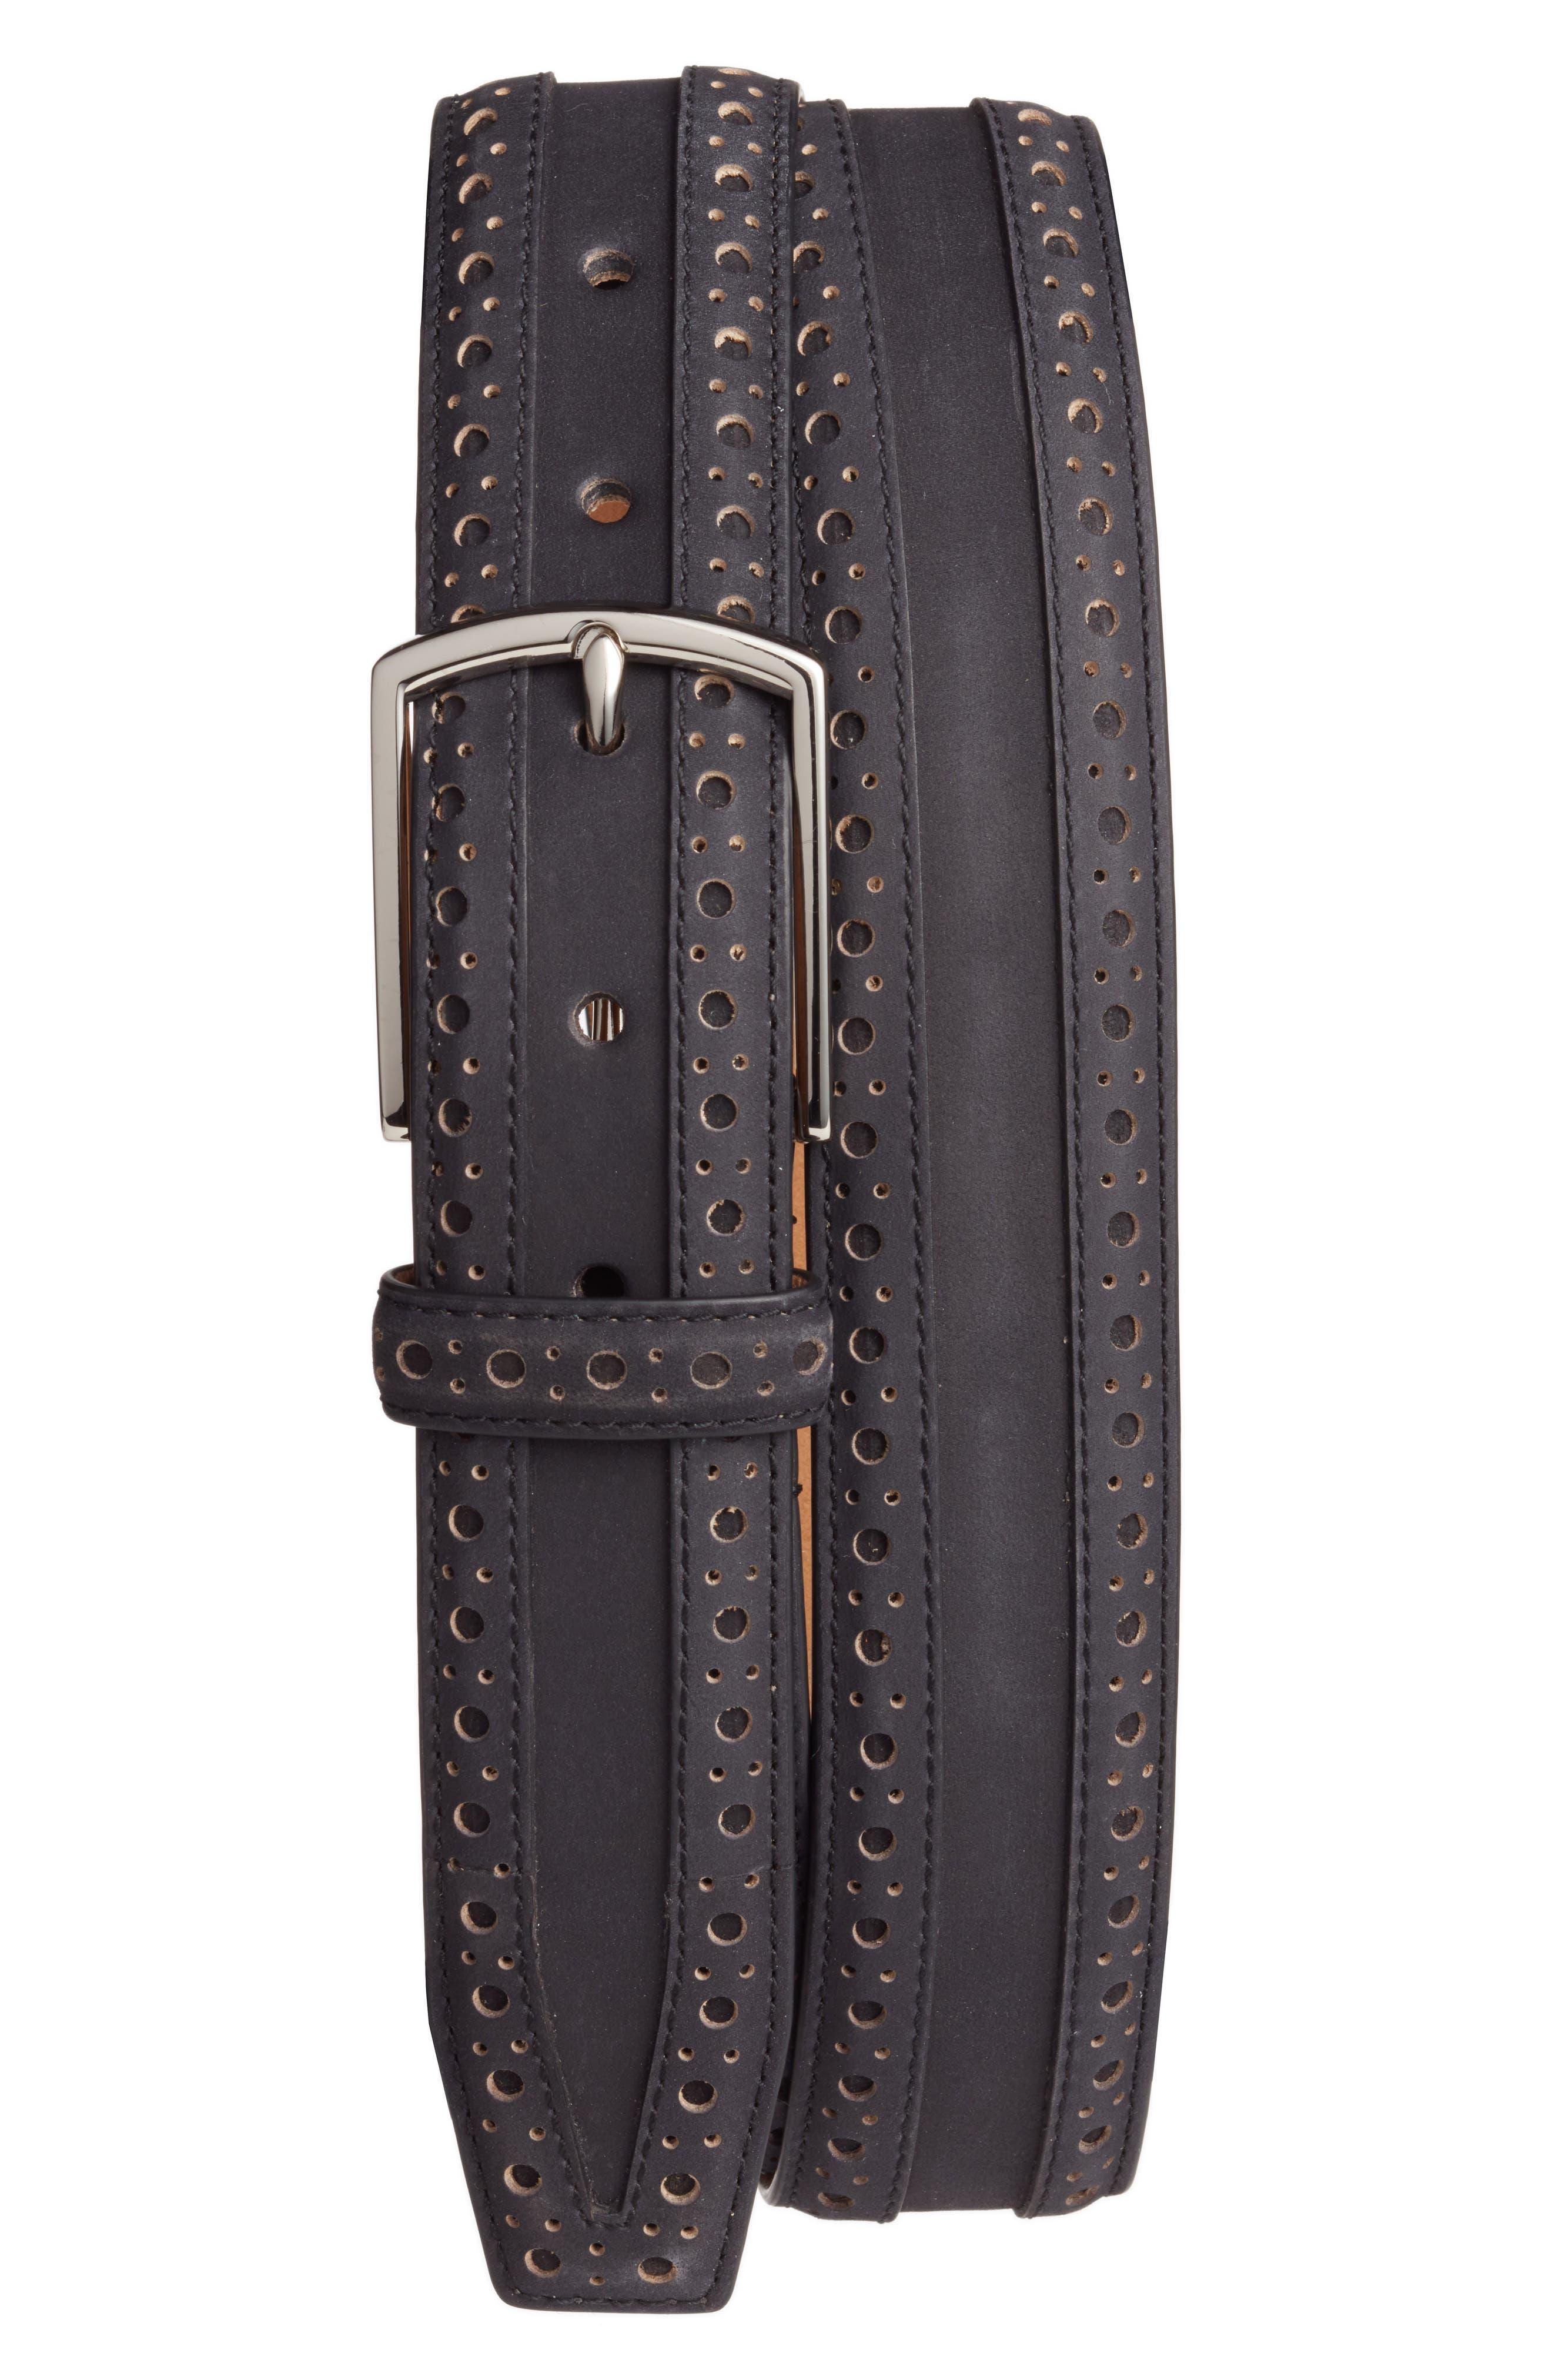 COLE HAAN,                             Brogue Nubuck Leather Belt,                             Main thumbnail 1, color,                             001